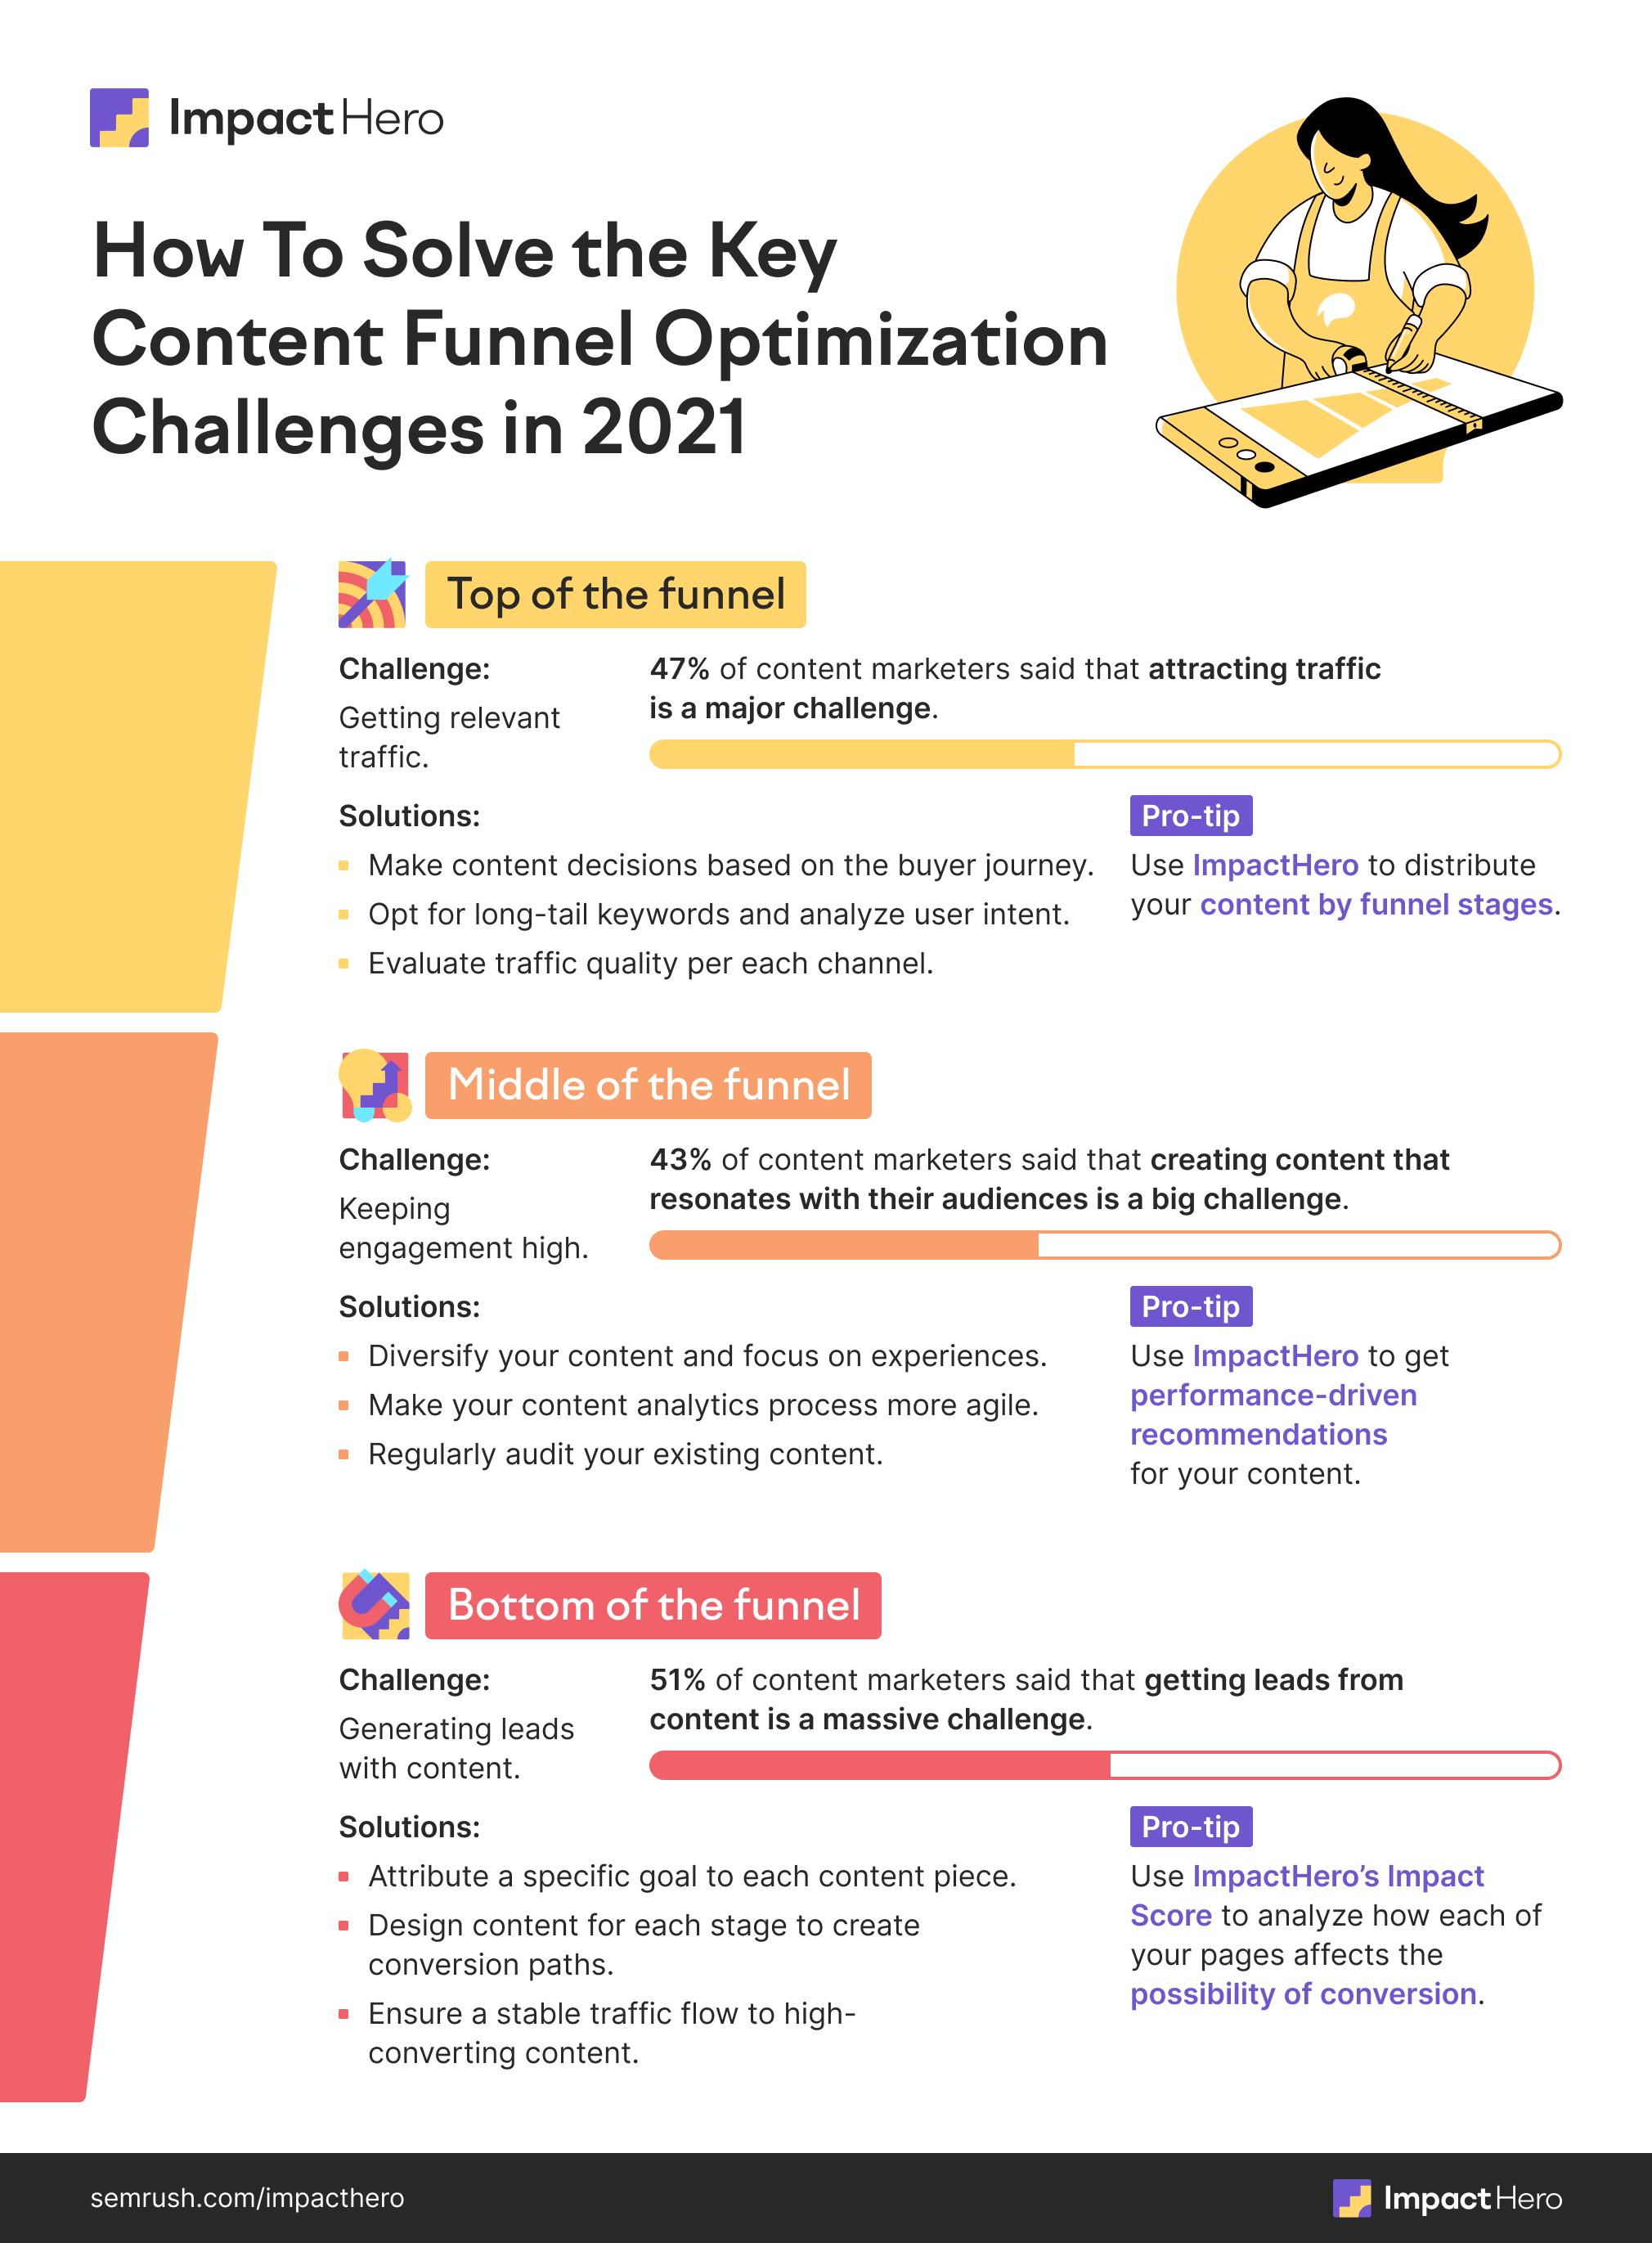 Content Funnel Optimization 2021